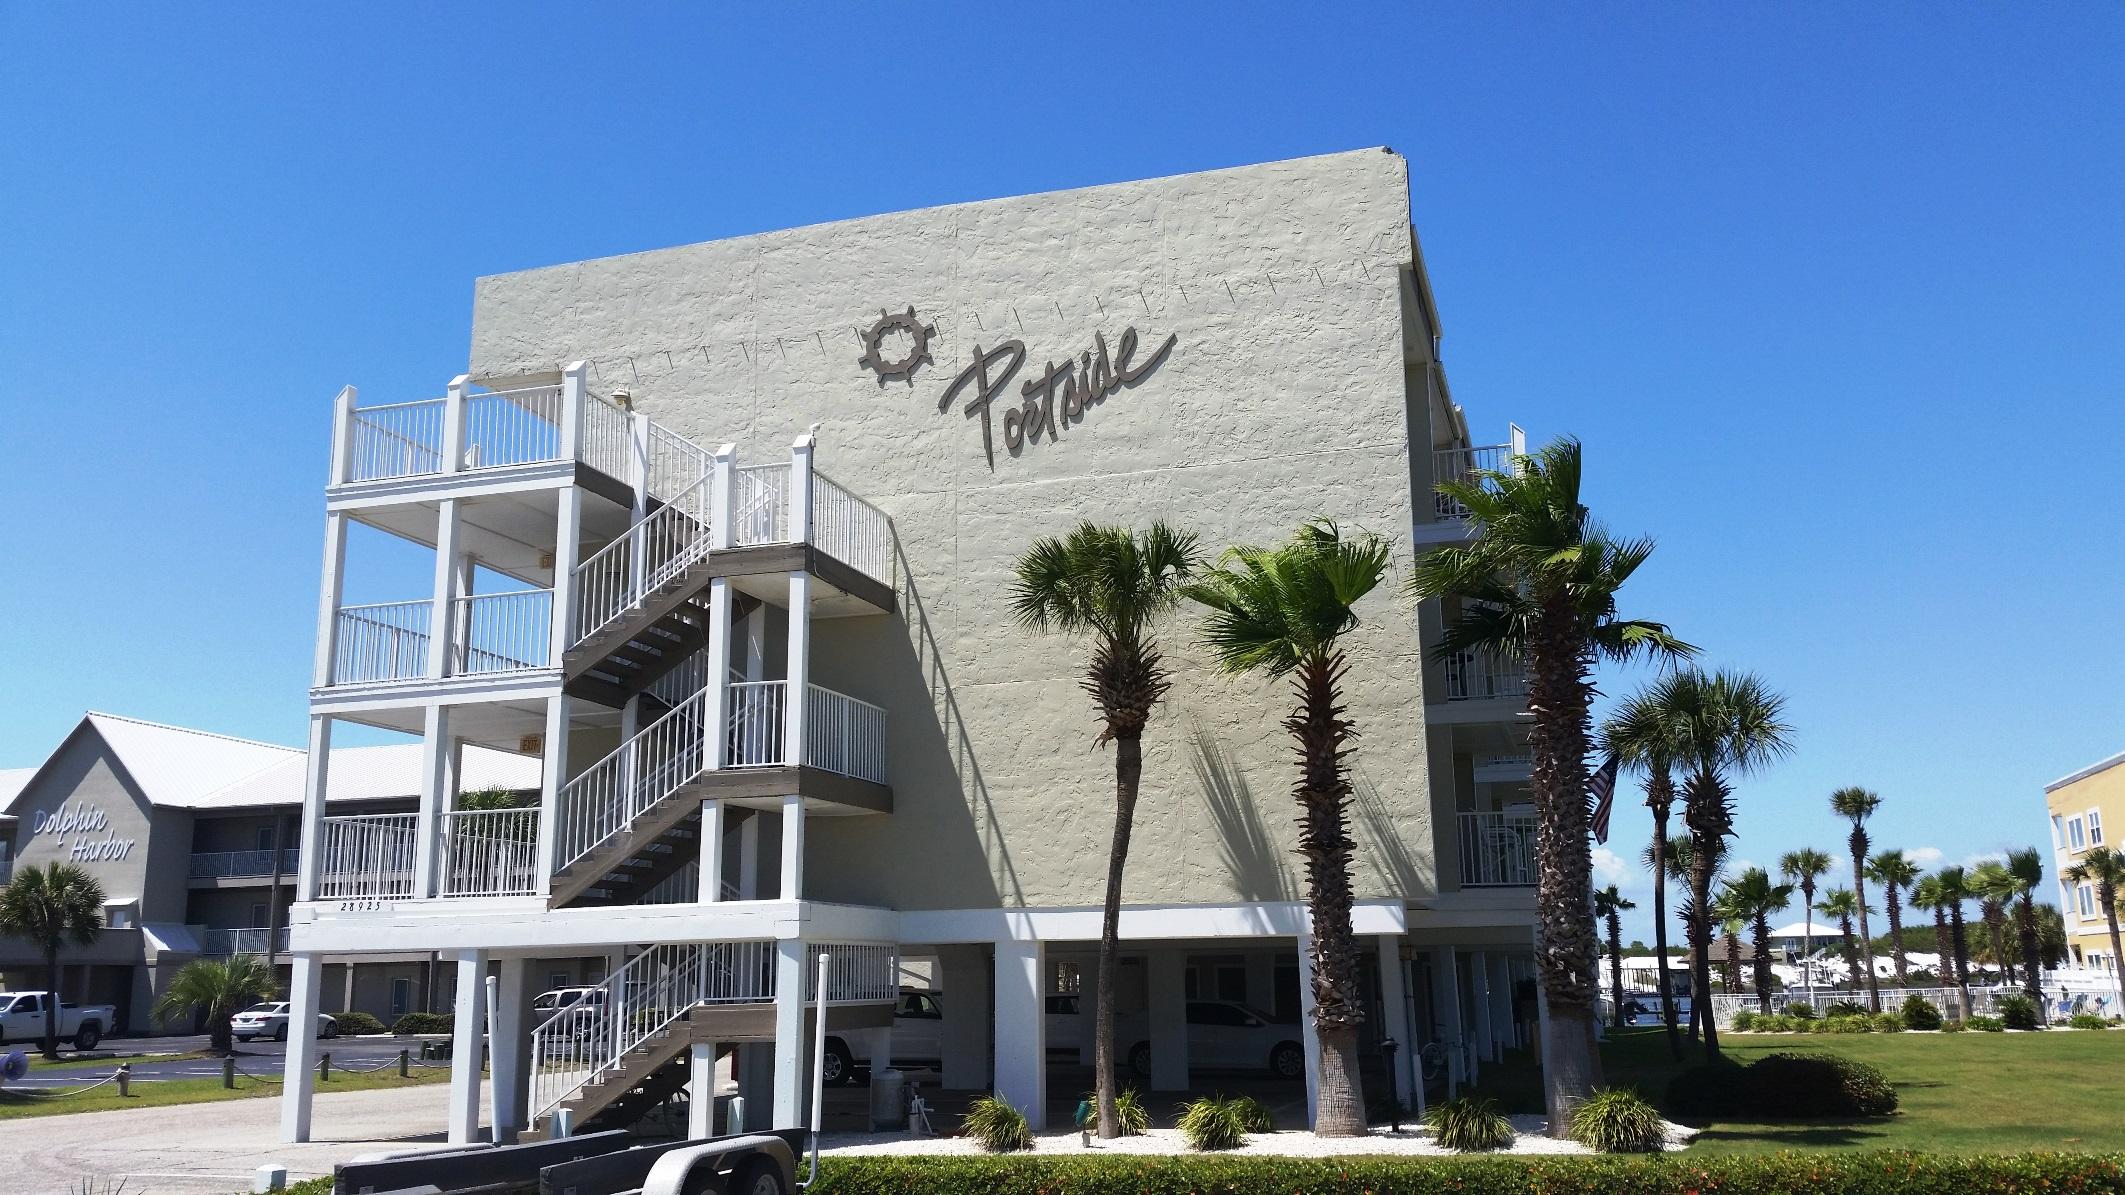 portside 304 orange beach rental condo